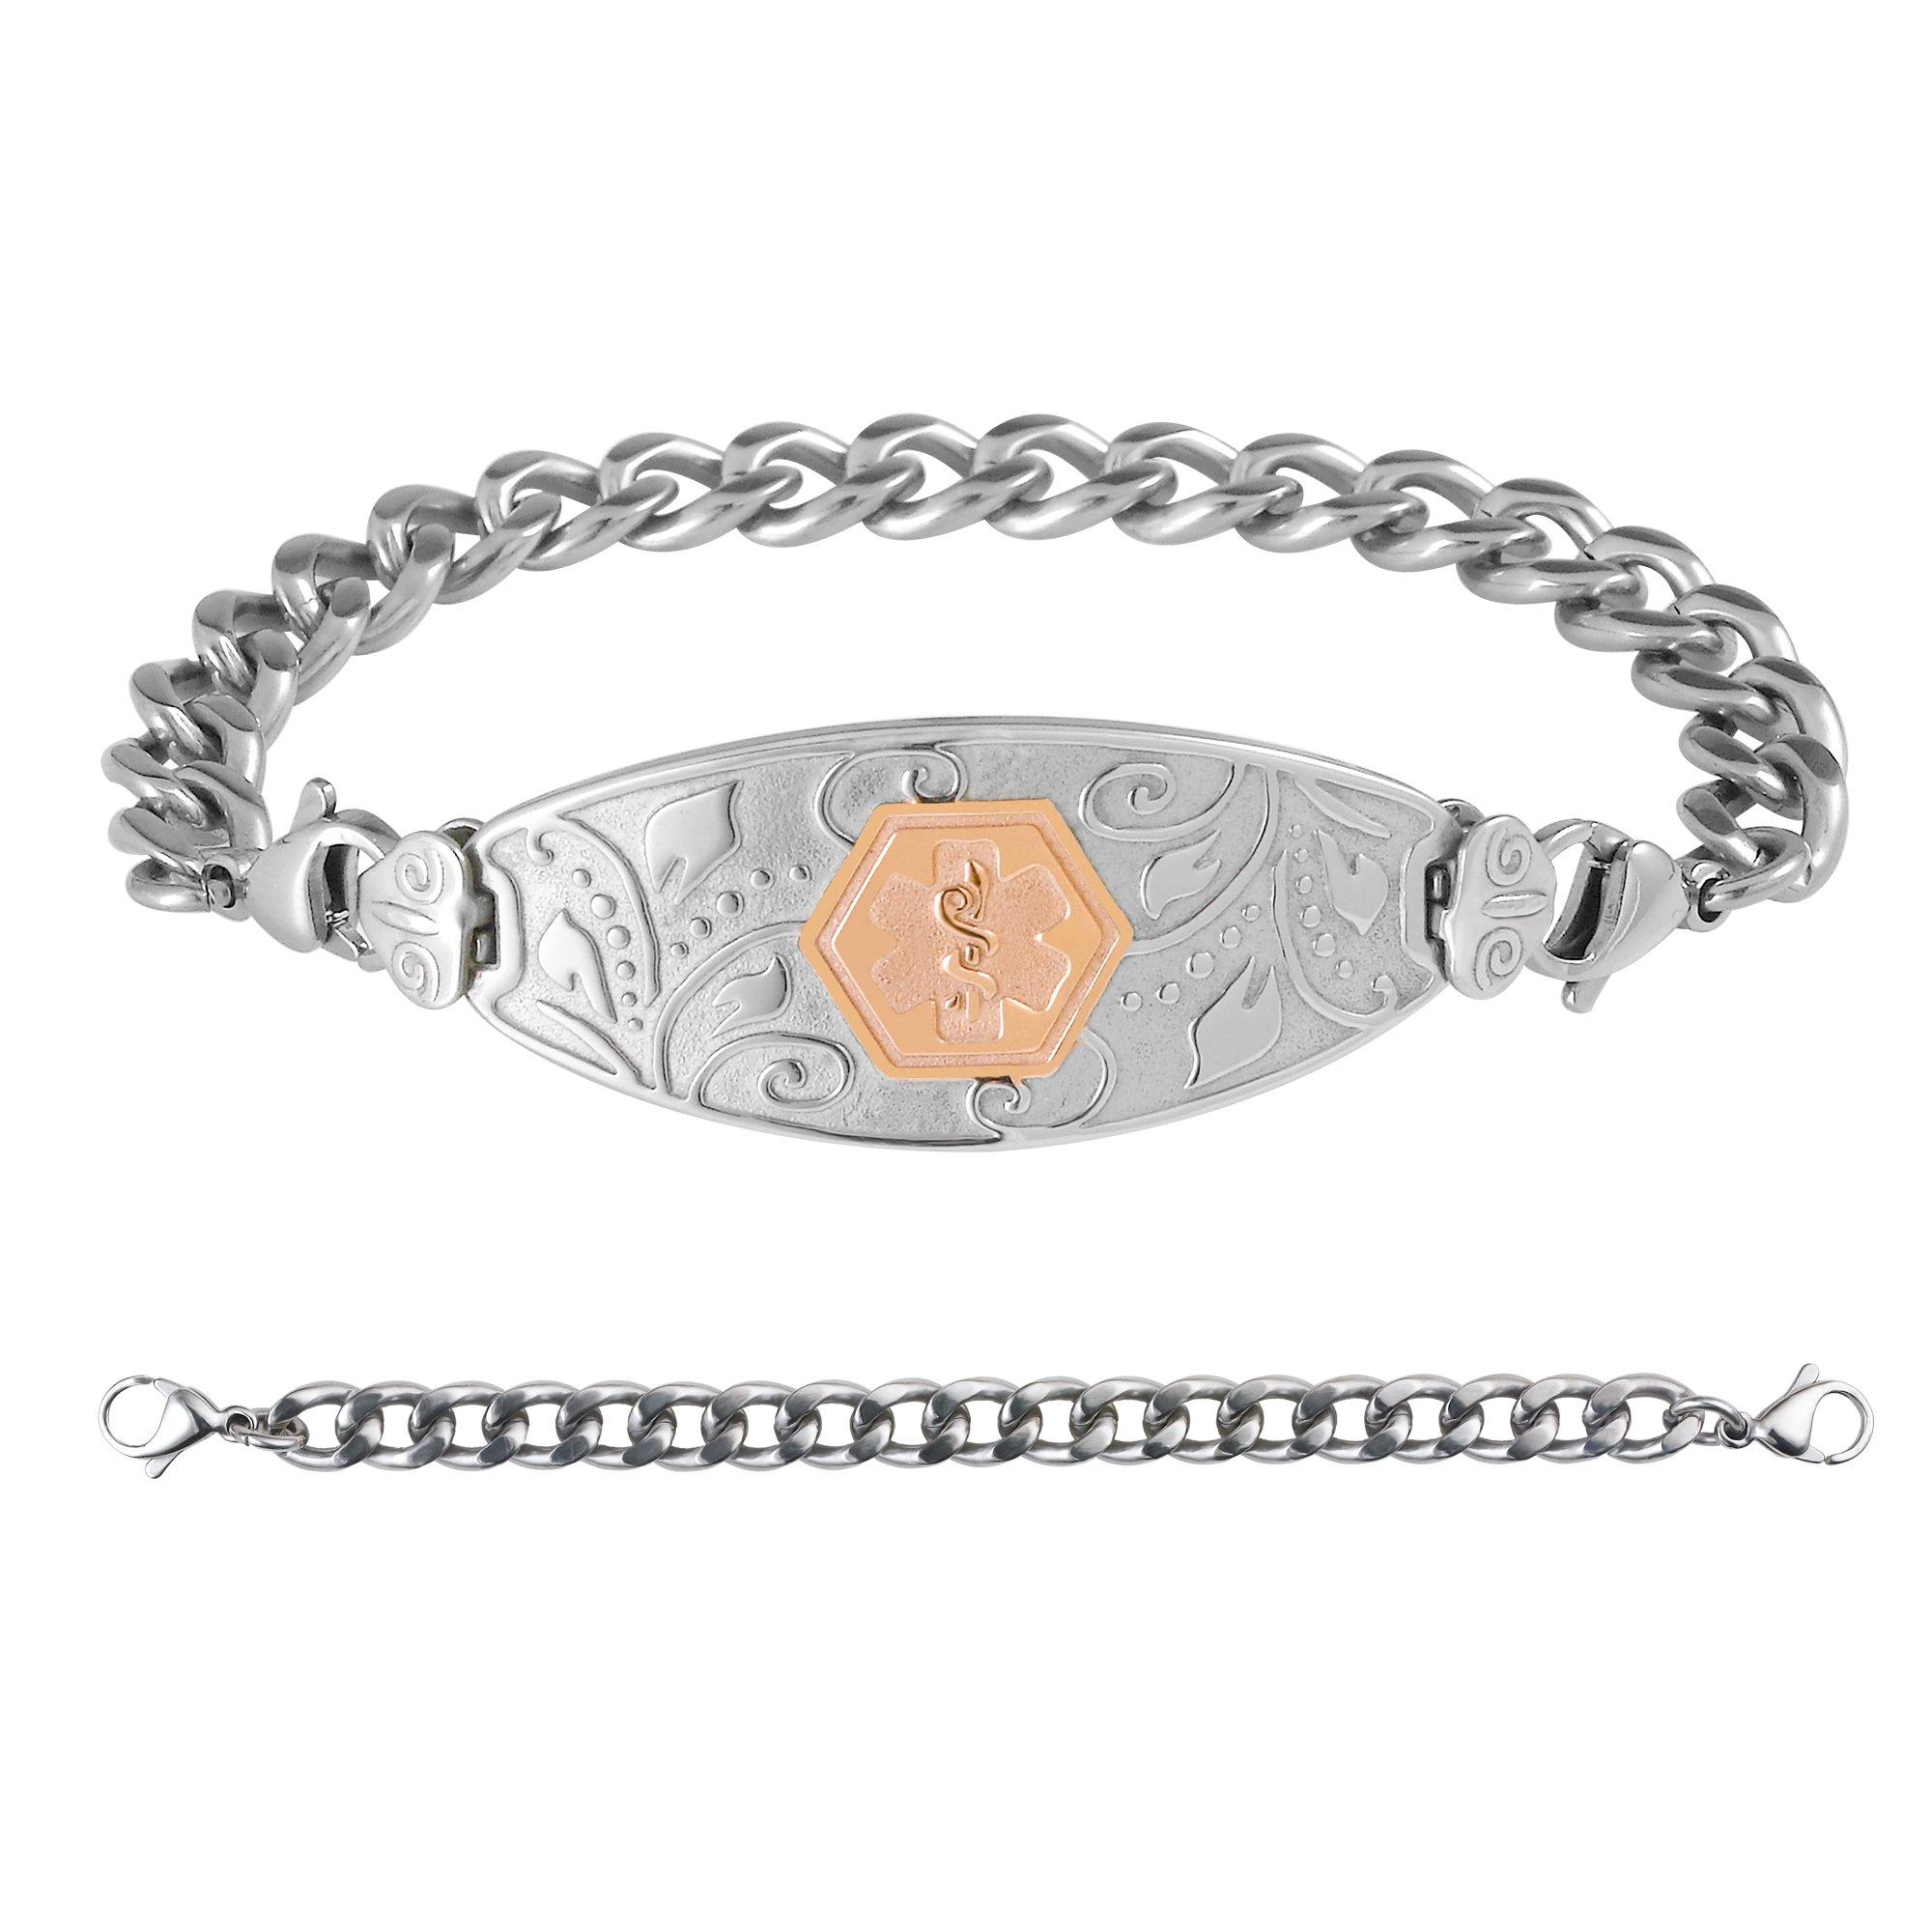 Divoti Custom Engraved Medical Alert Bracelets for Women, Pure Titanium Medical Bracelet, Medical ID Bracelet w/Free Engraving - Lovely Filigree Tag w/Titanium Curb-PVD Rose Gold-8.0'' by Divoti